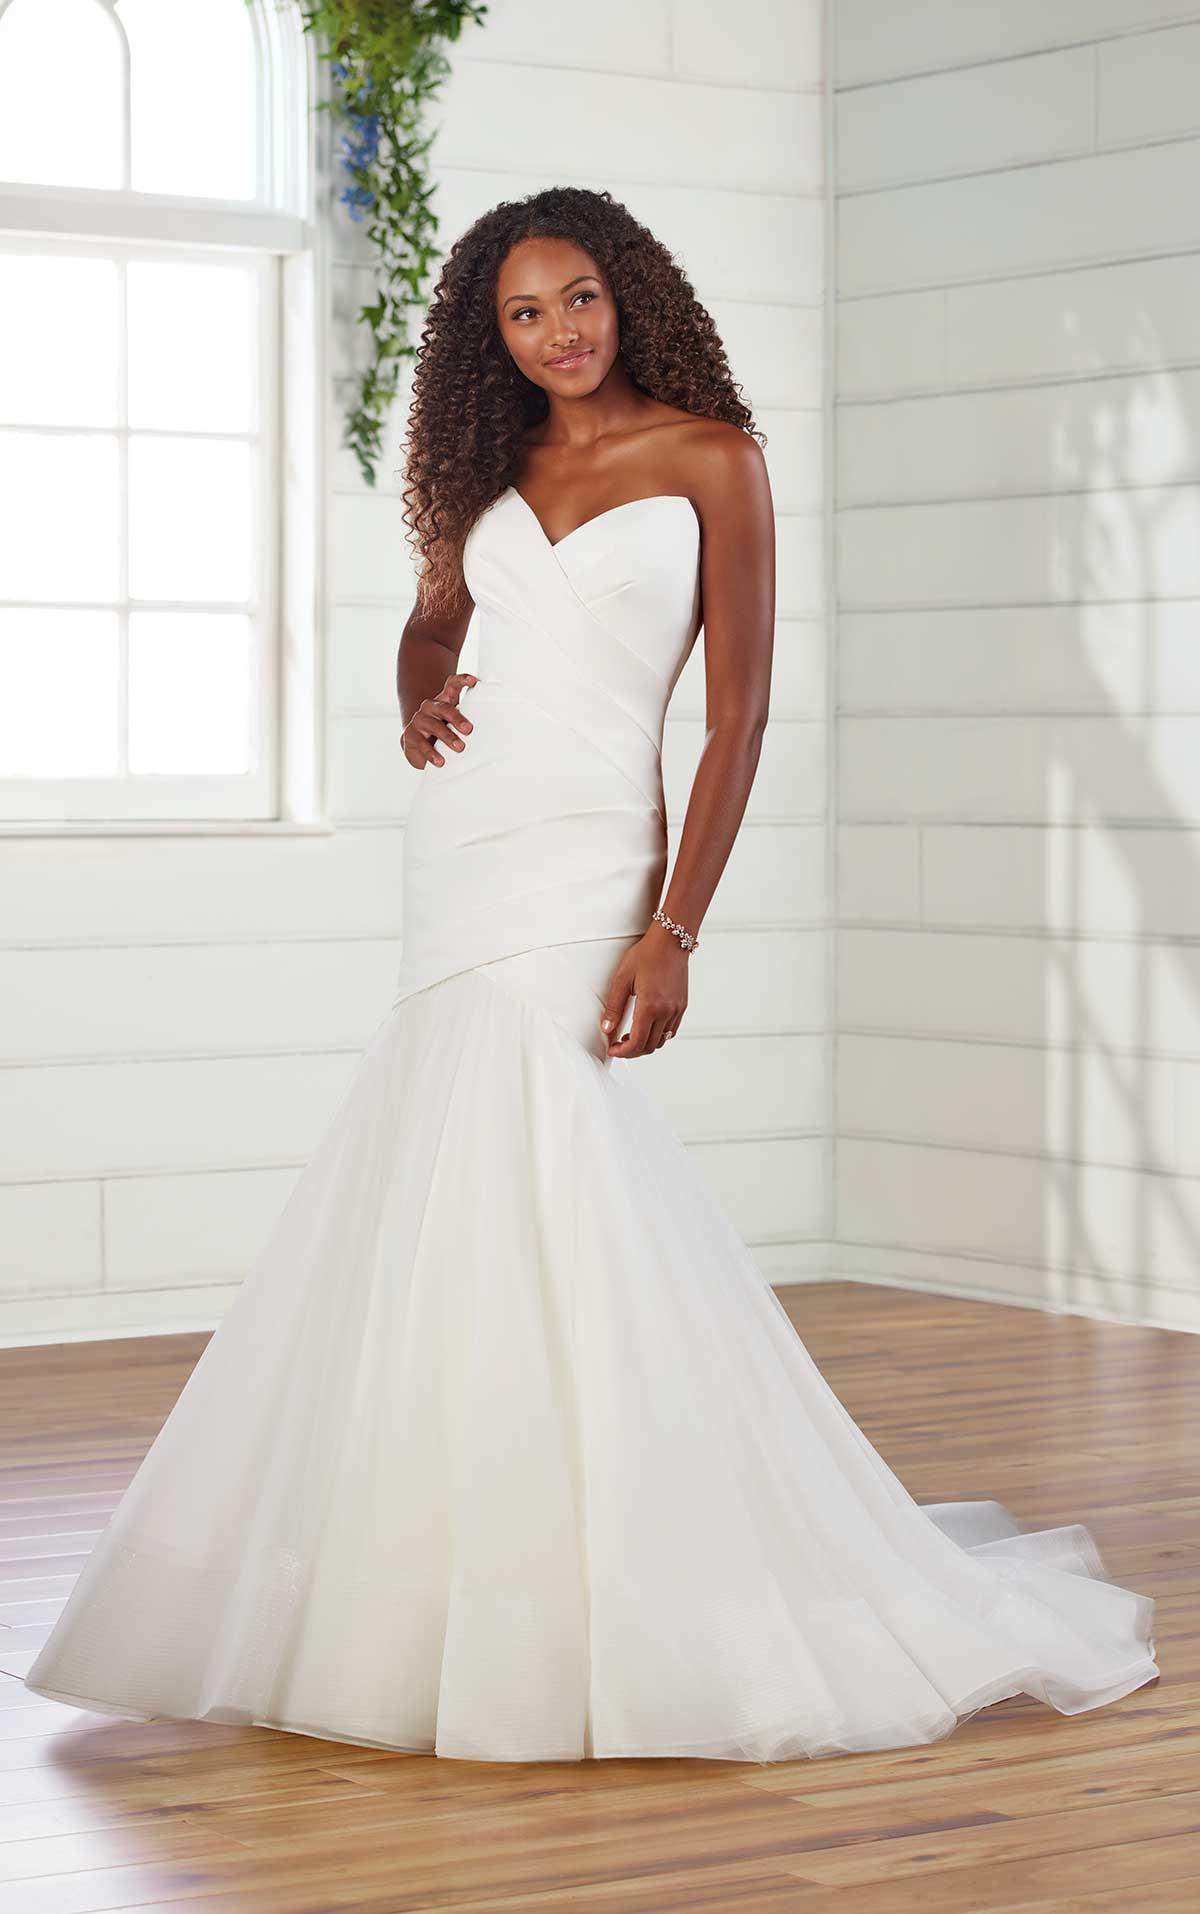 Strapless Pleated Fit And Flare Wedding Dress Kleinfeld Bridal,Wedding Dress Washington Dc